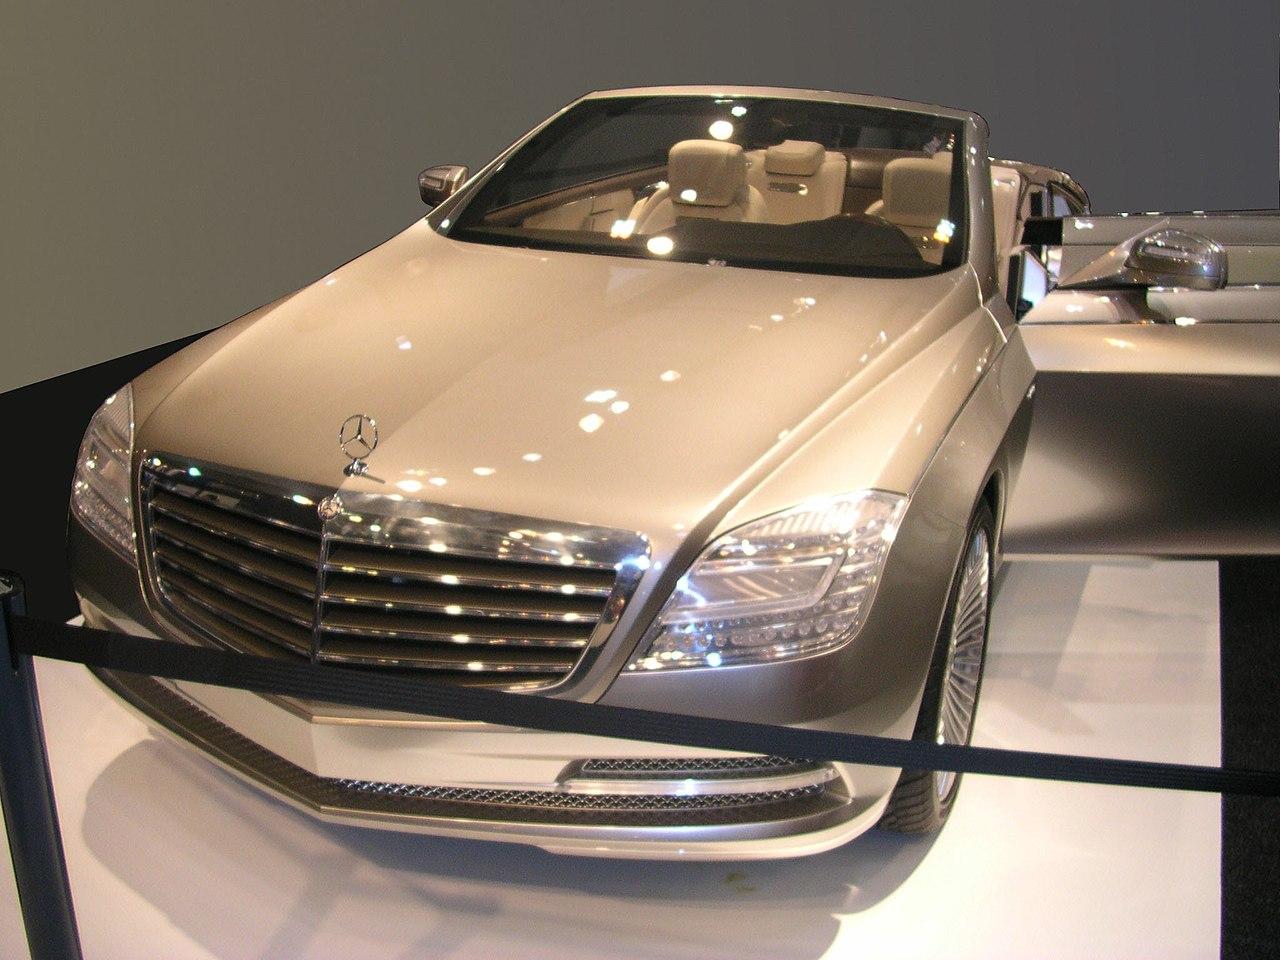 Original file 2 048 1 536 pixels file size 310 kb for Mercedes benz ocean drive